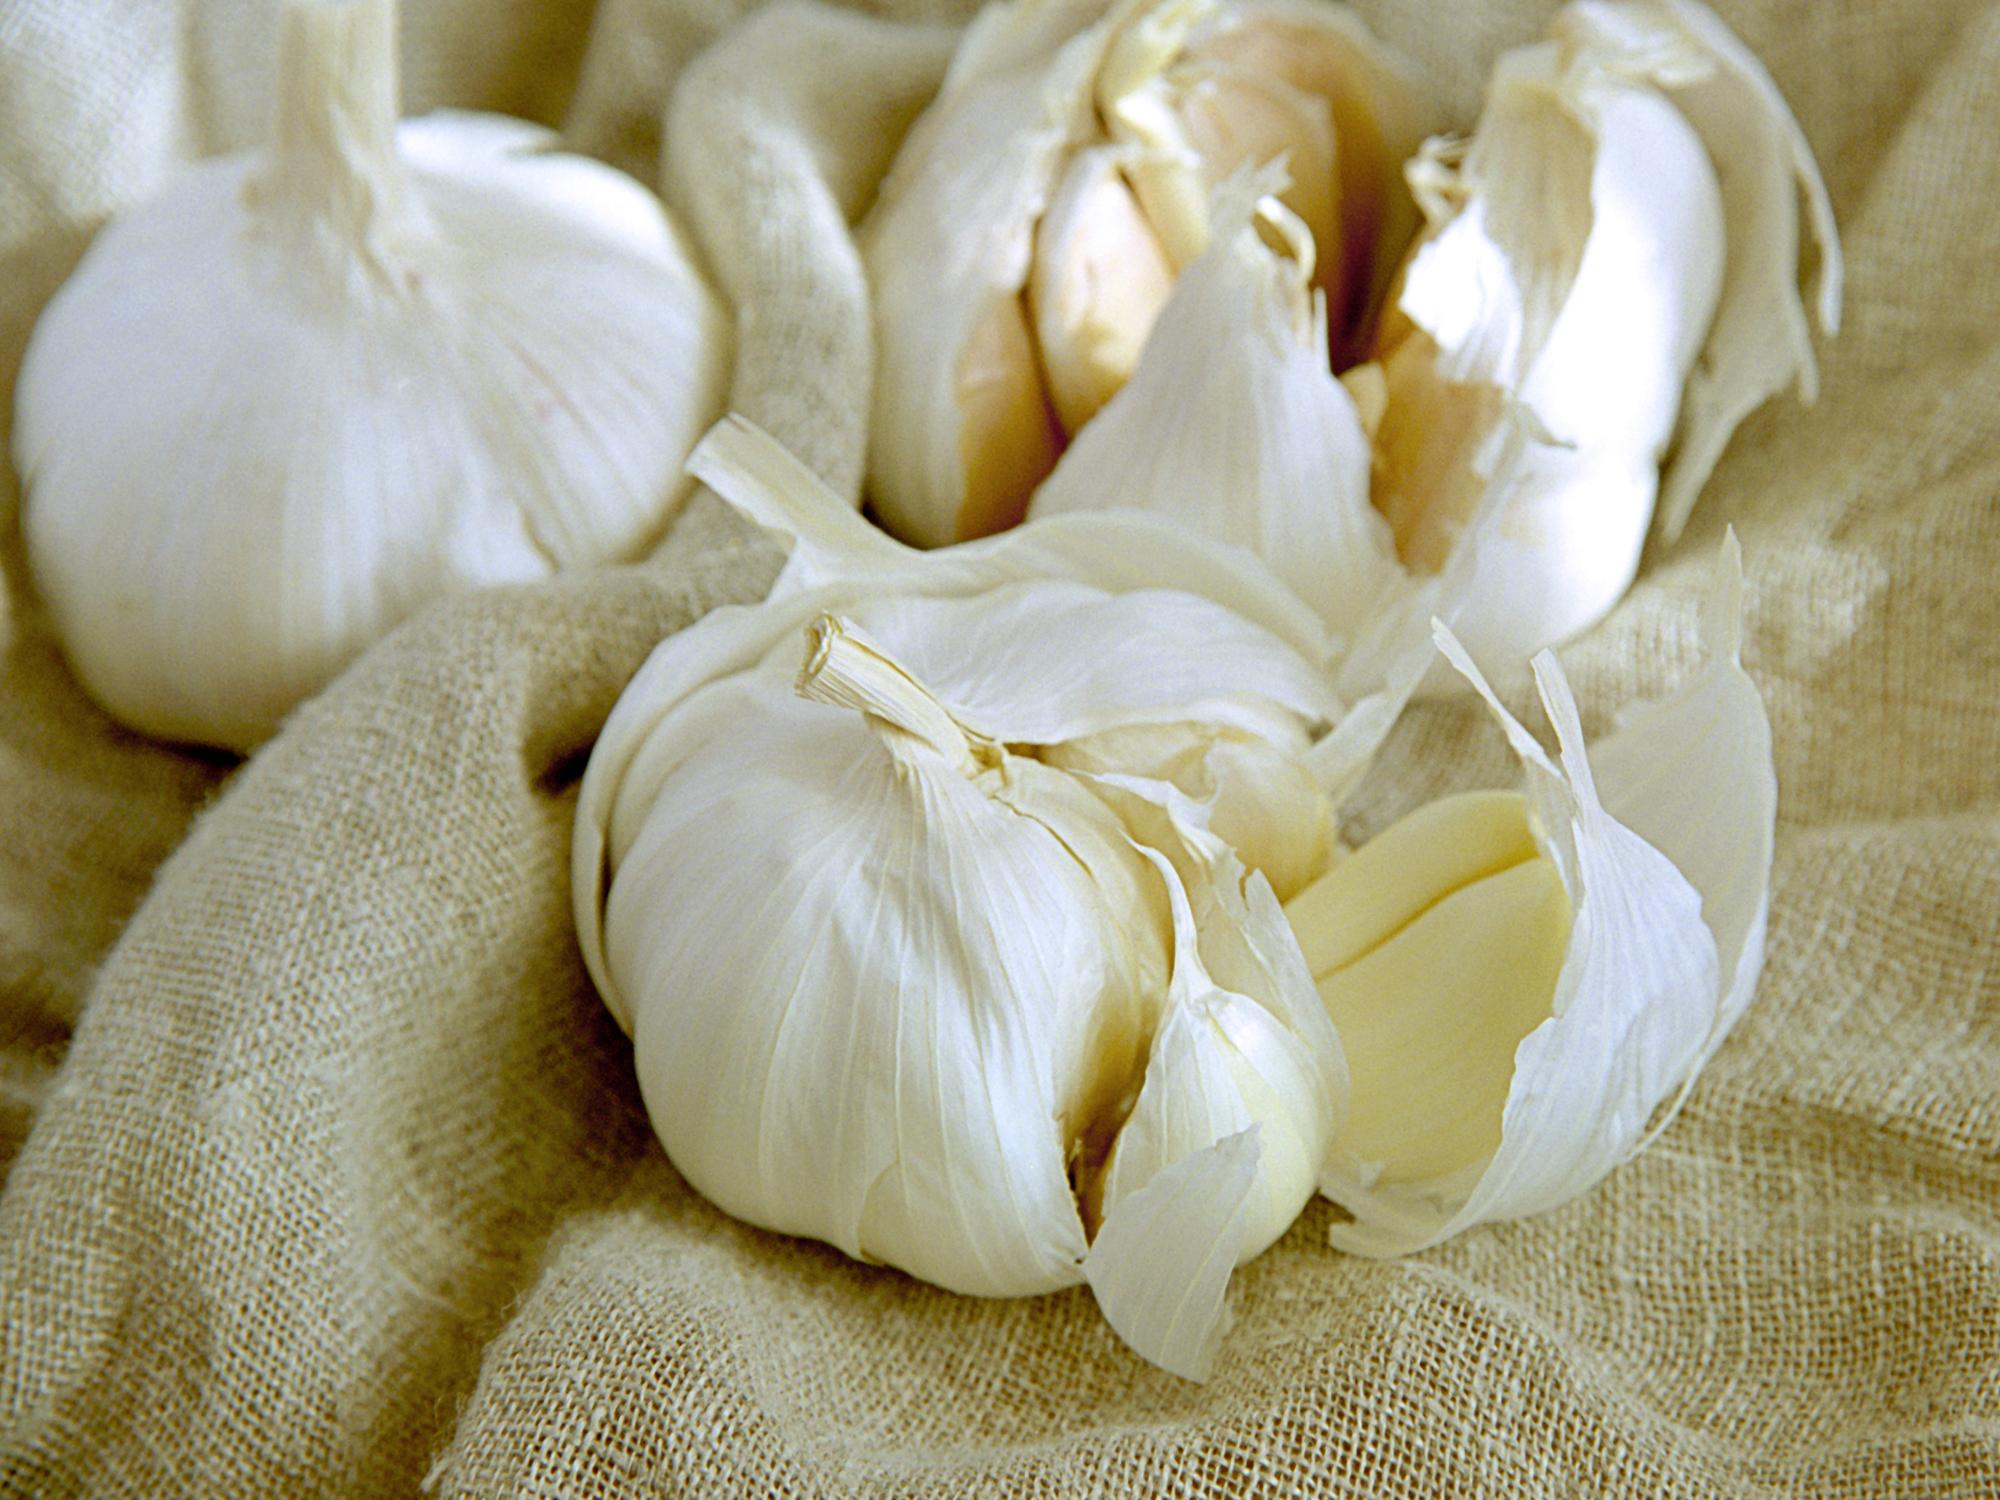 Get your garlic fix without garlic breath